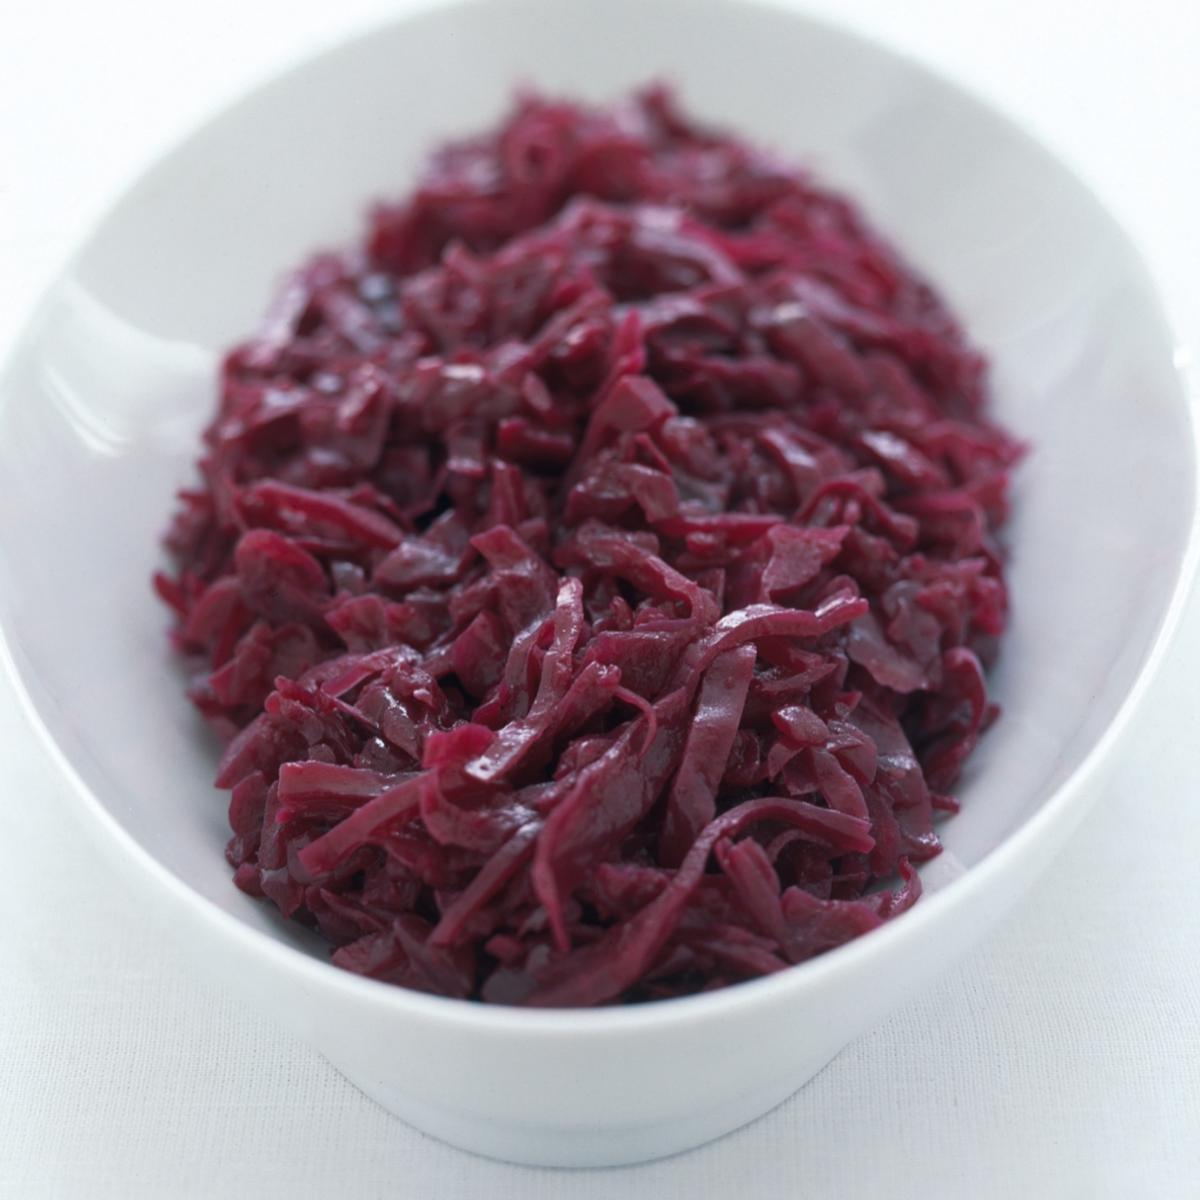 braised red cabbage recipe - photo #6